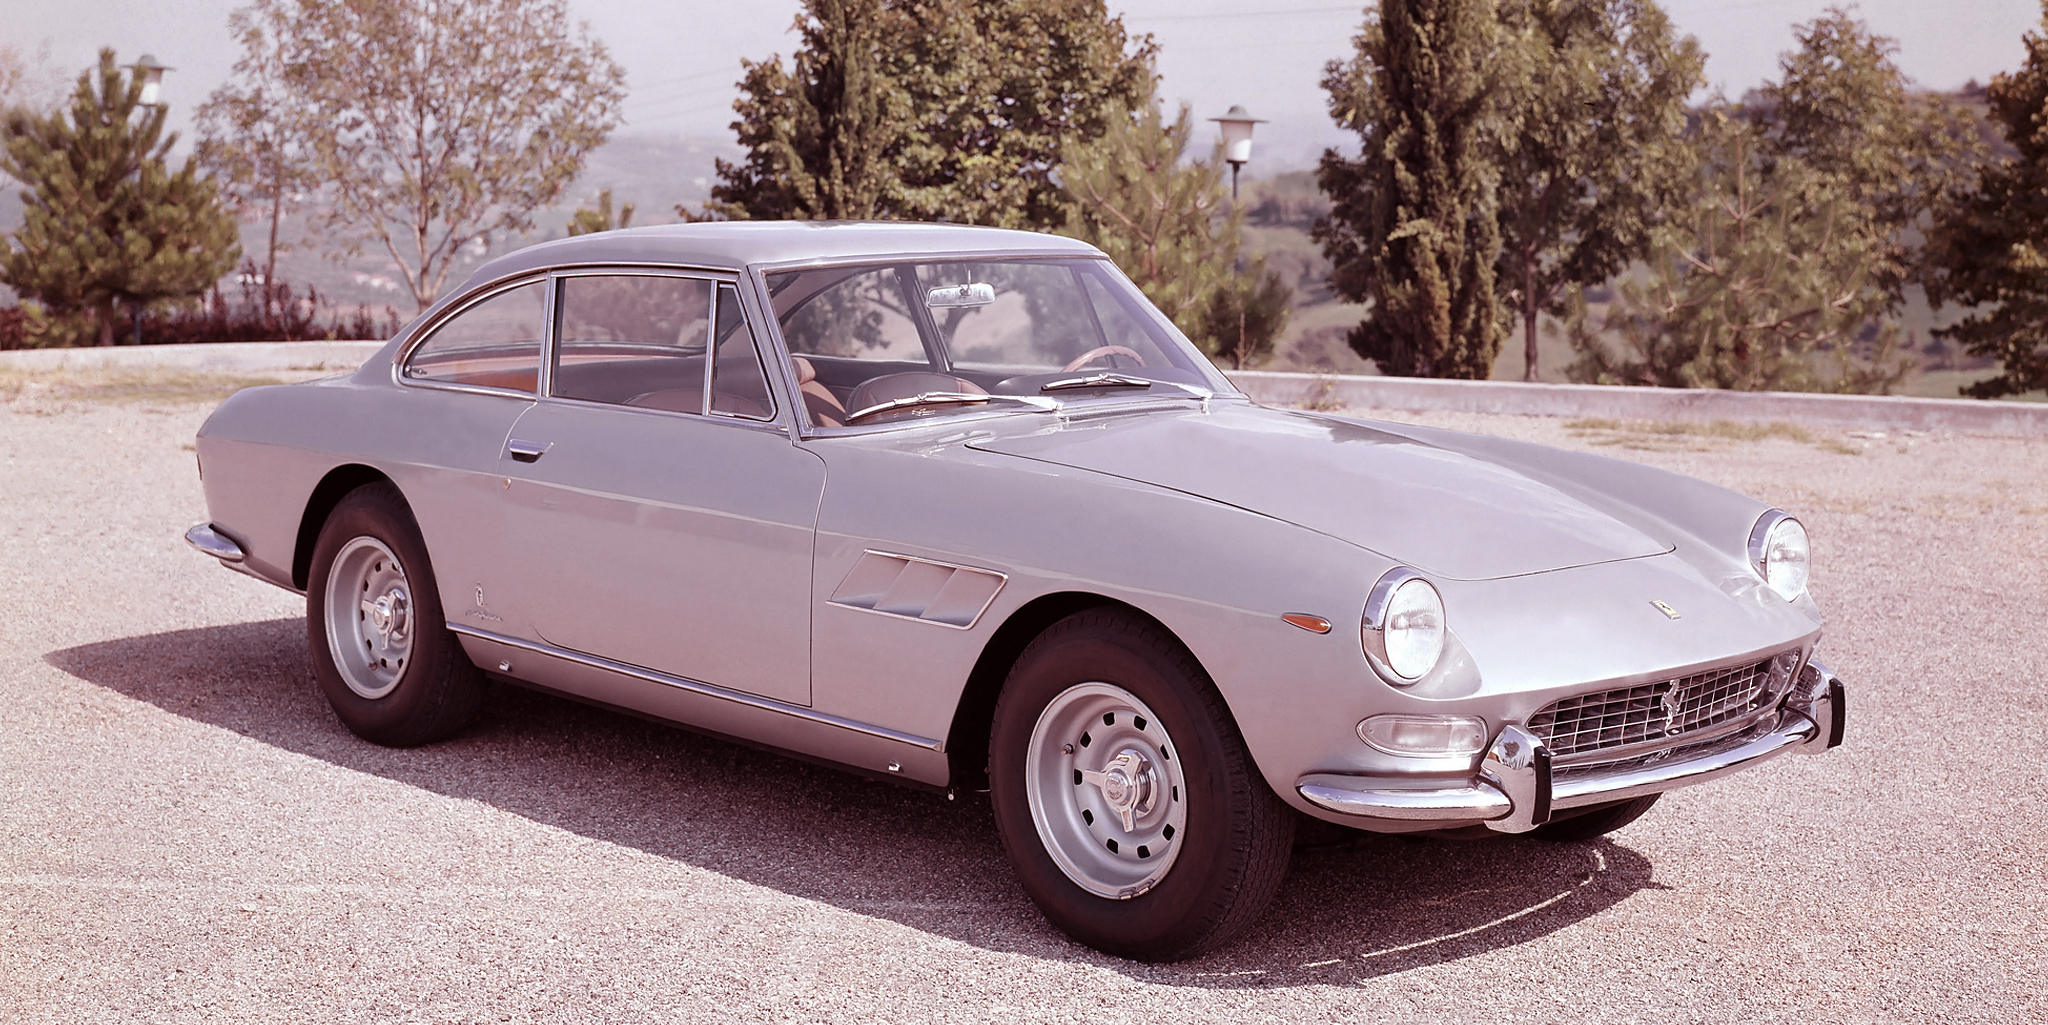 Ferrari Driving School New York >> A Brief History of the Four-Seat Ferrari